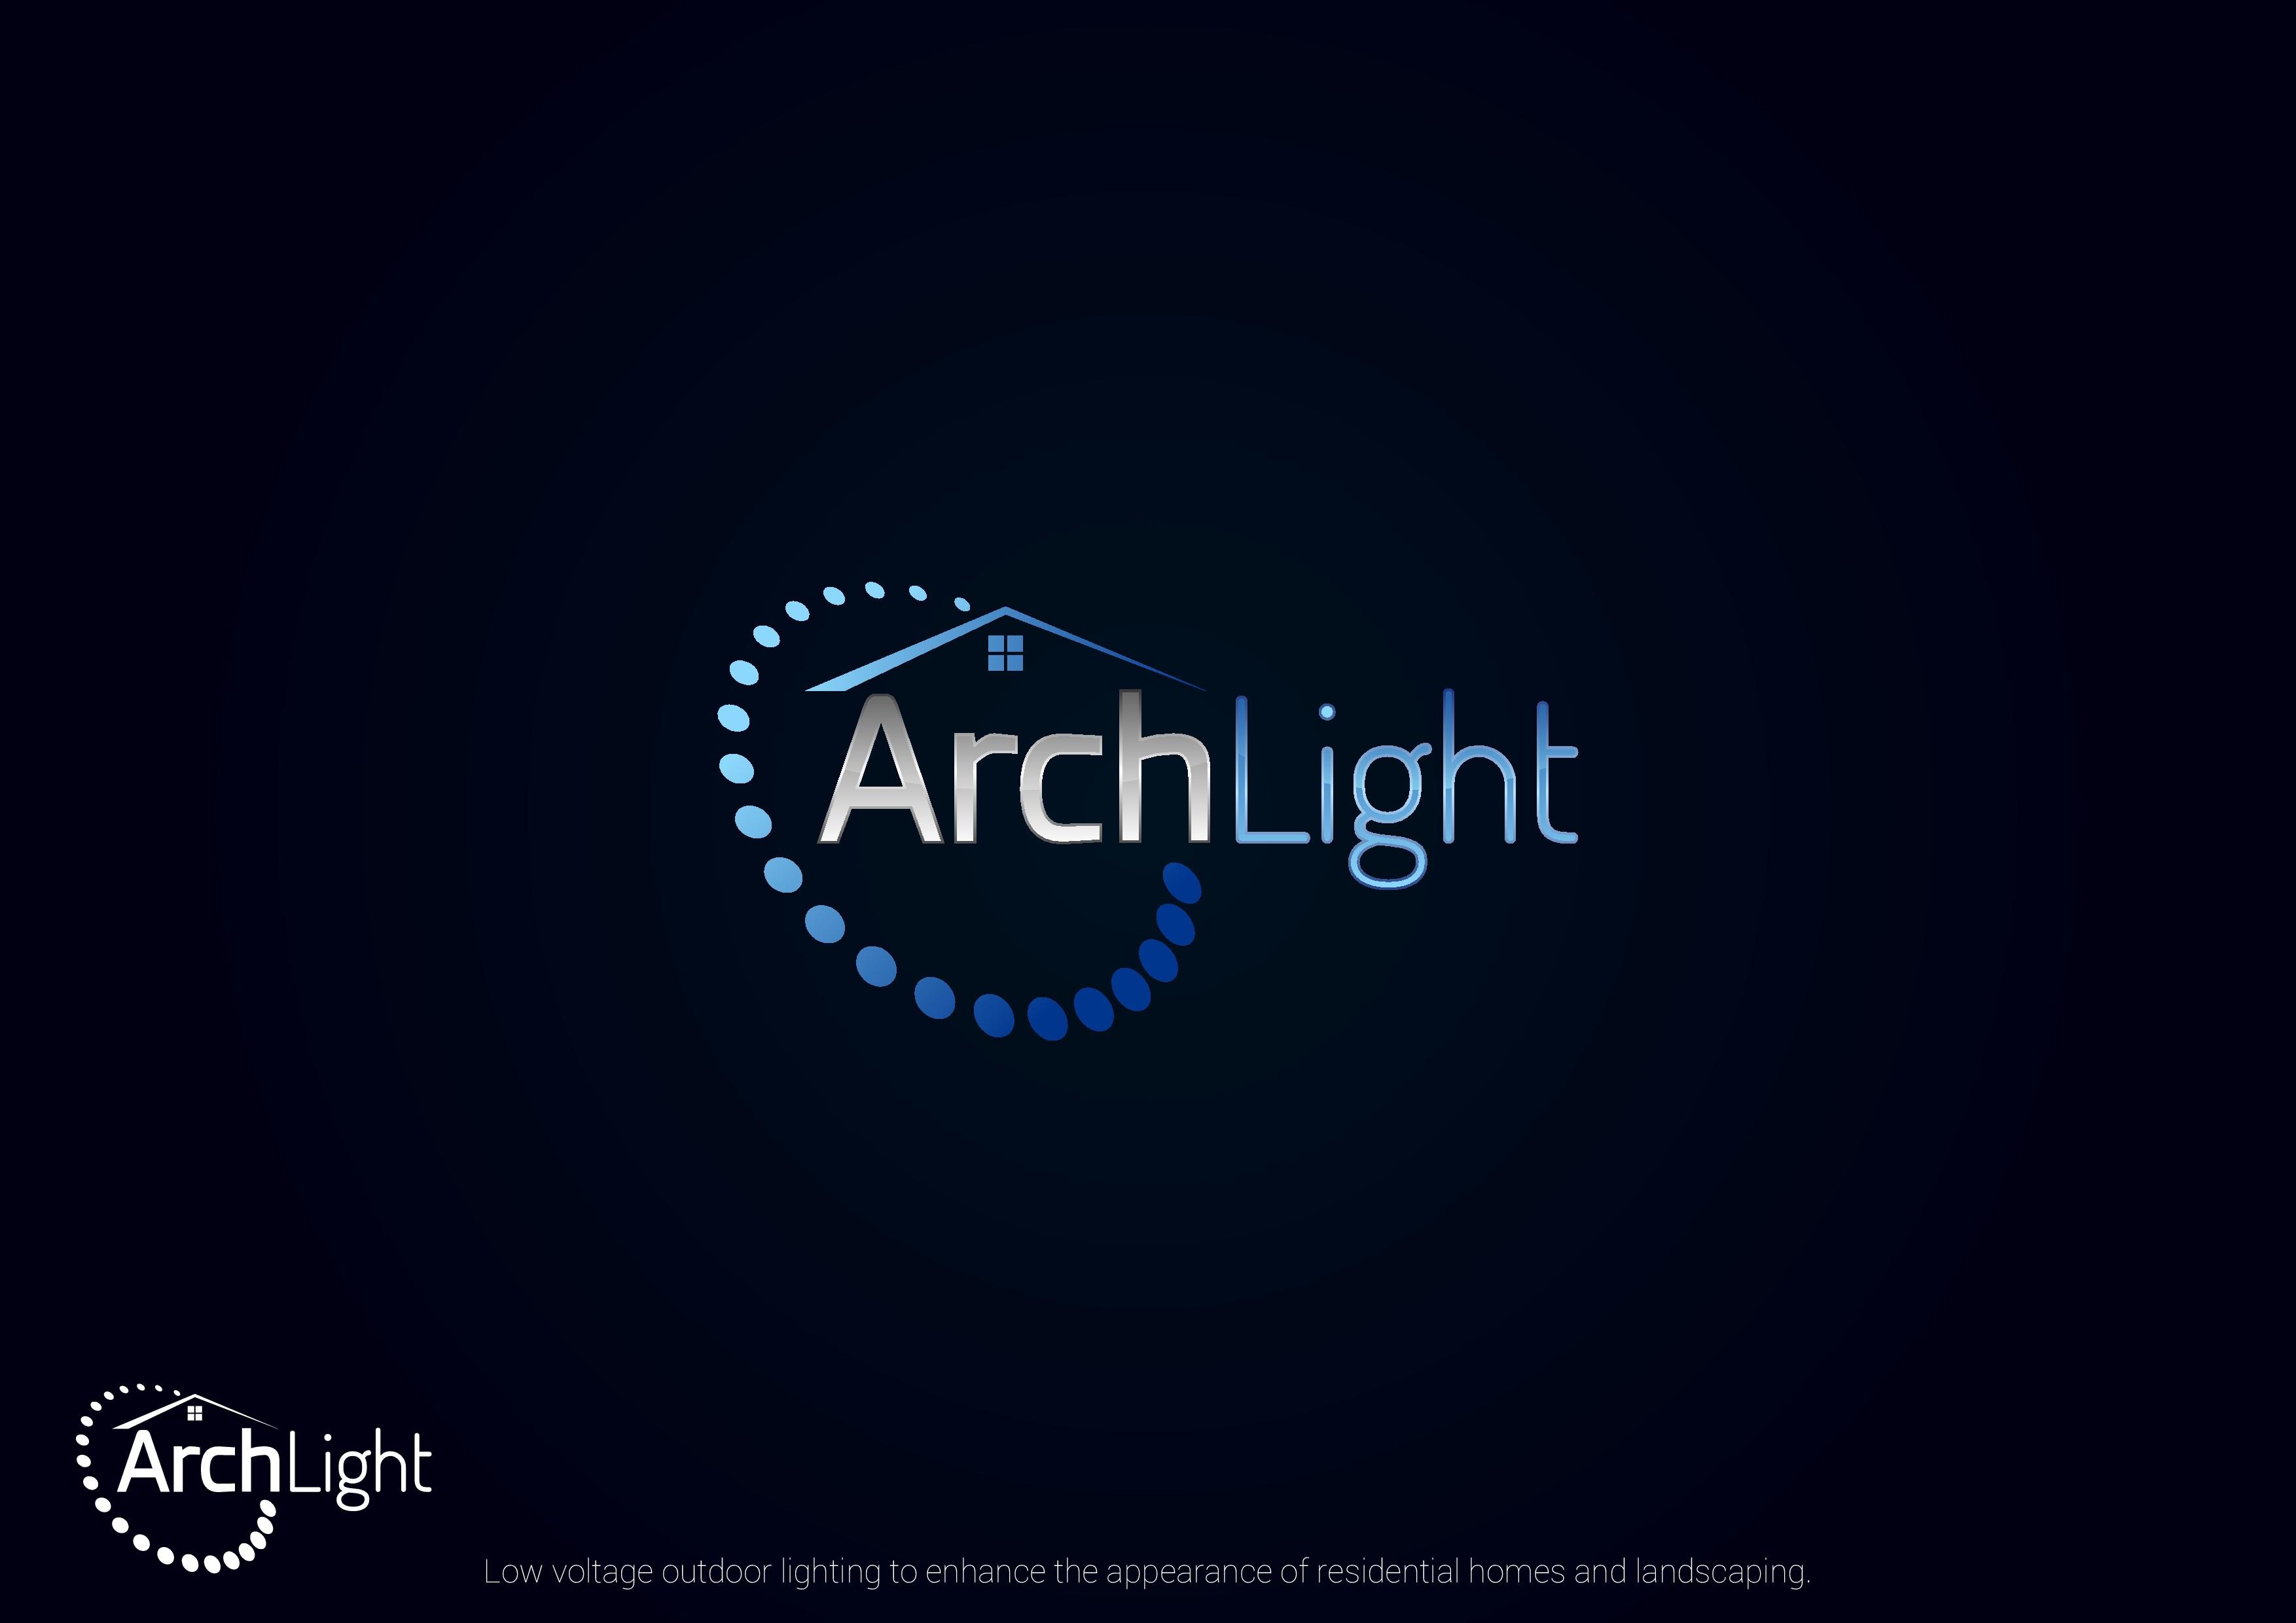 Create an elegantly modern logo for ArchLight outdoor lighting company